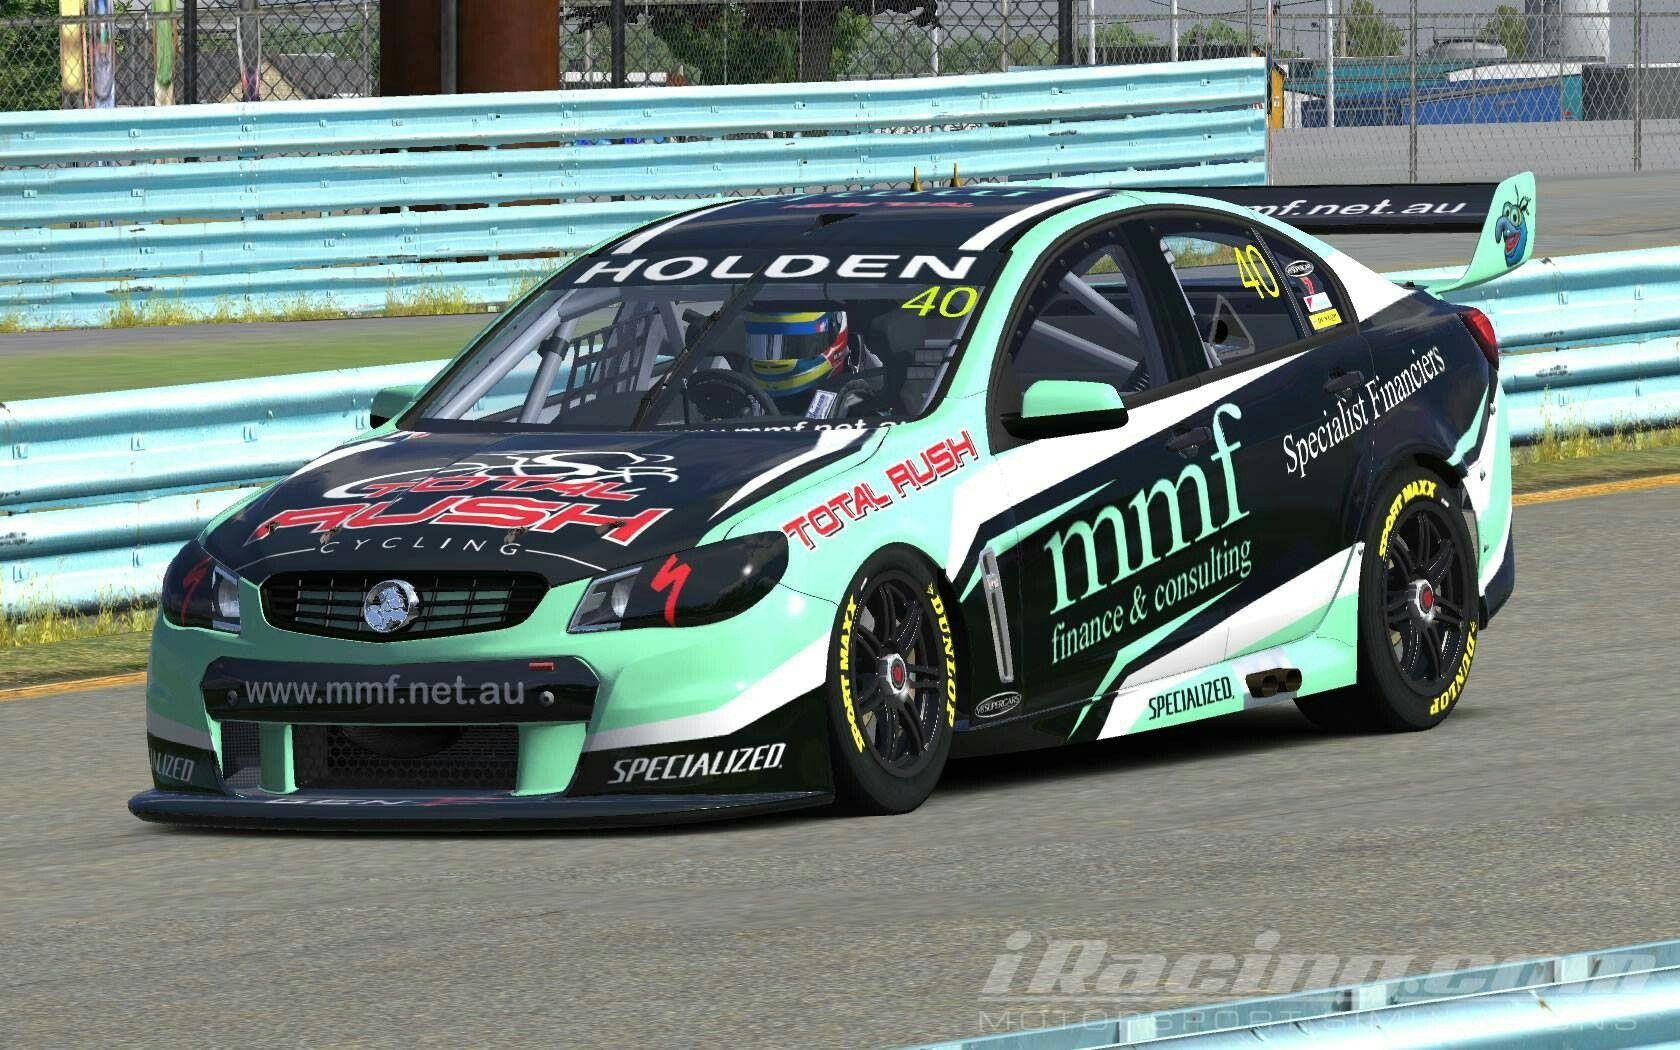 iracing custom paint job designs | torque motorsport blog, latest